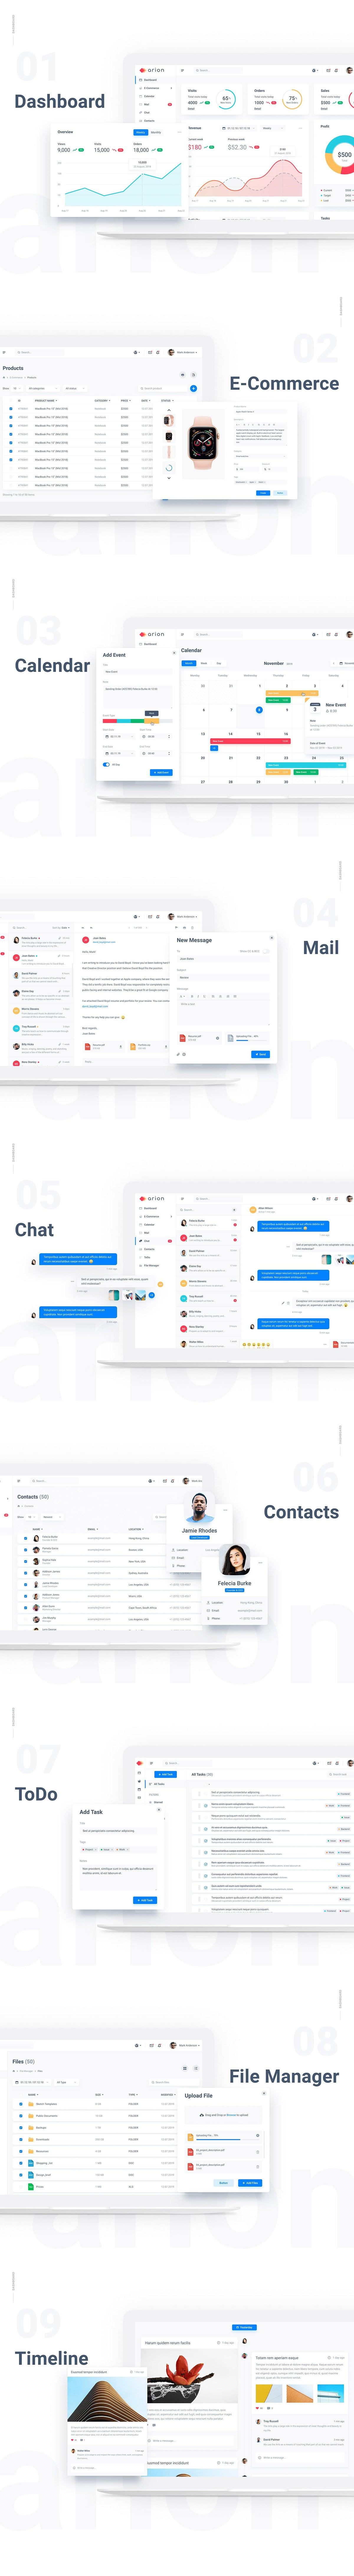 02 Presentation - Arion – Admin Dashboard & UI Kit Sketch Template